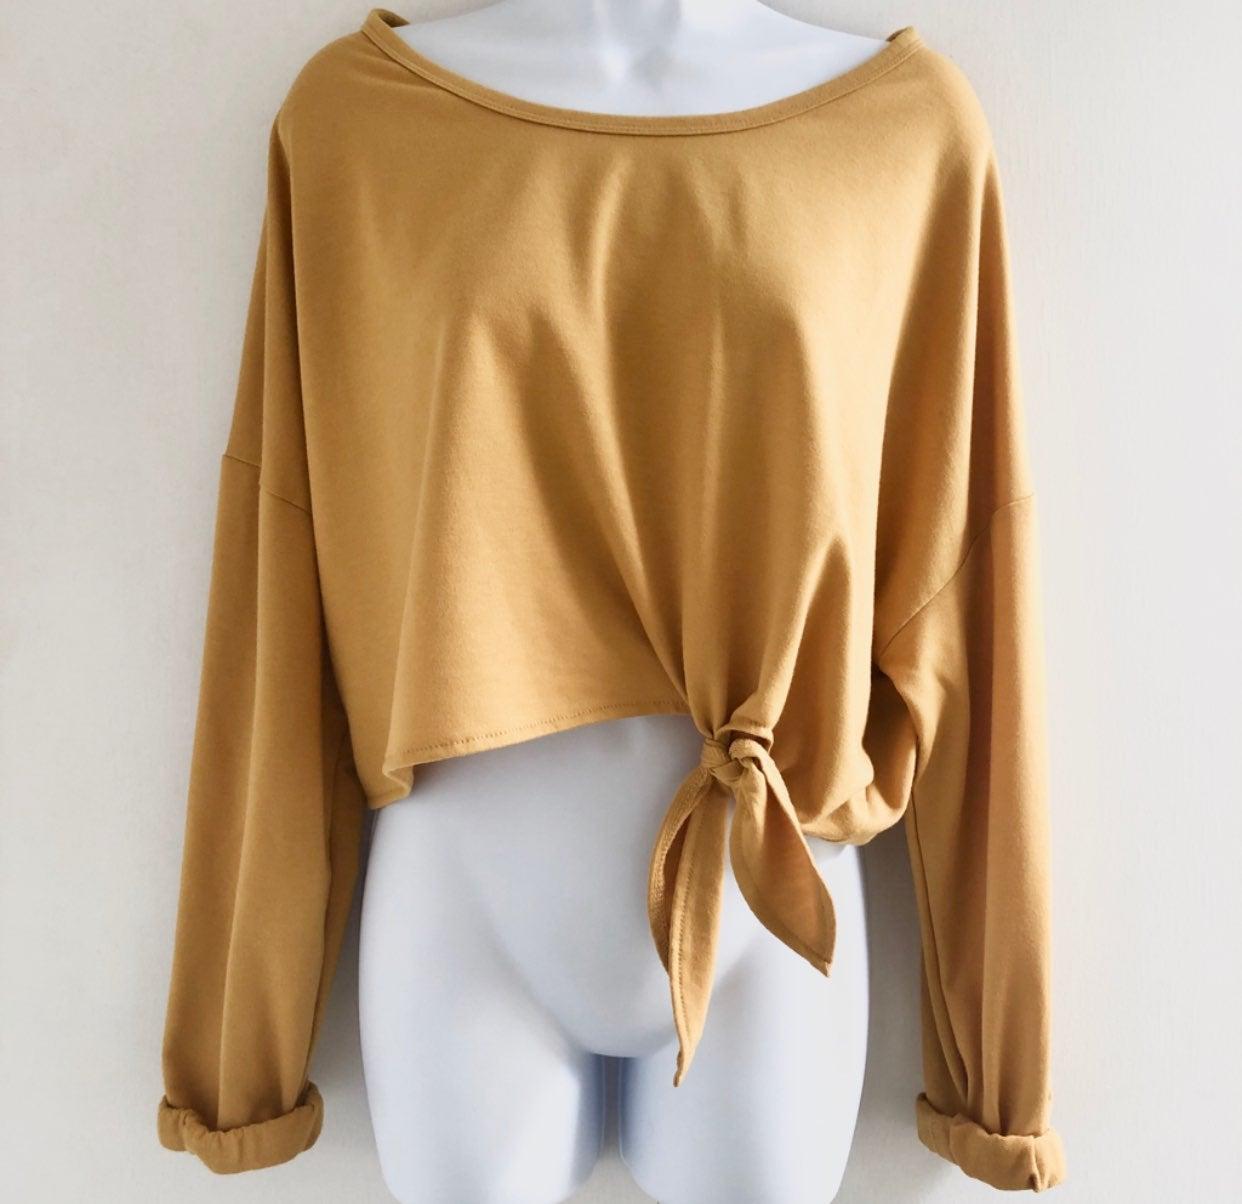 Streetwear Society • Boxy Tie Sweater